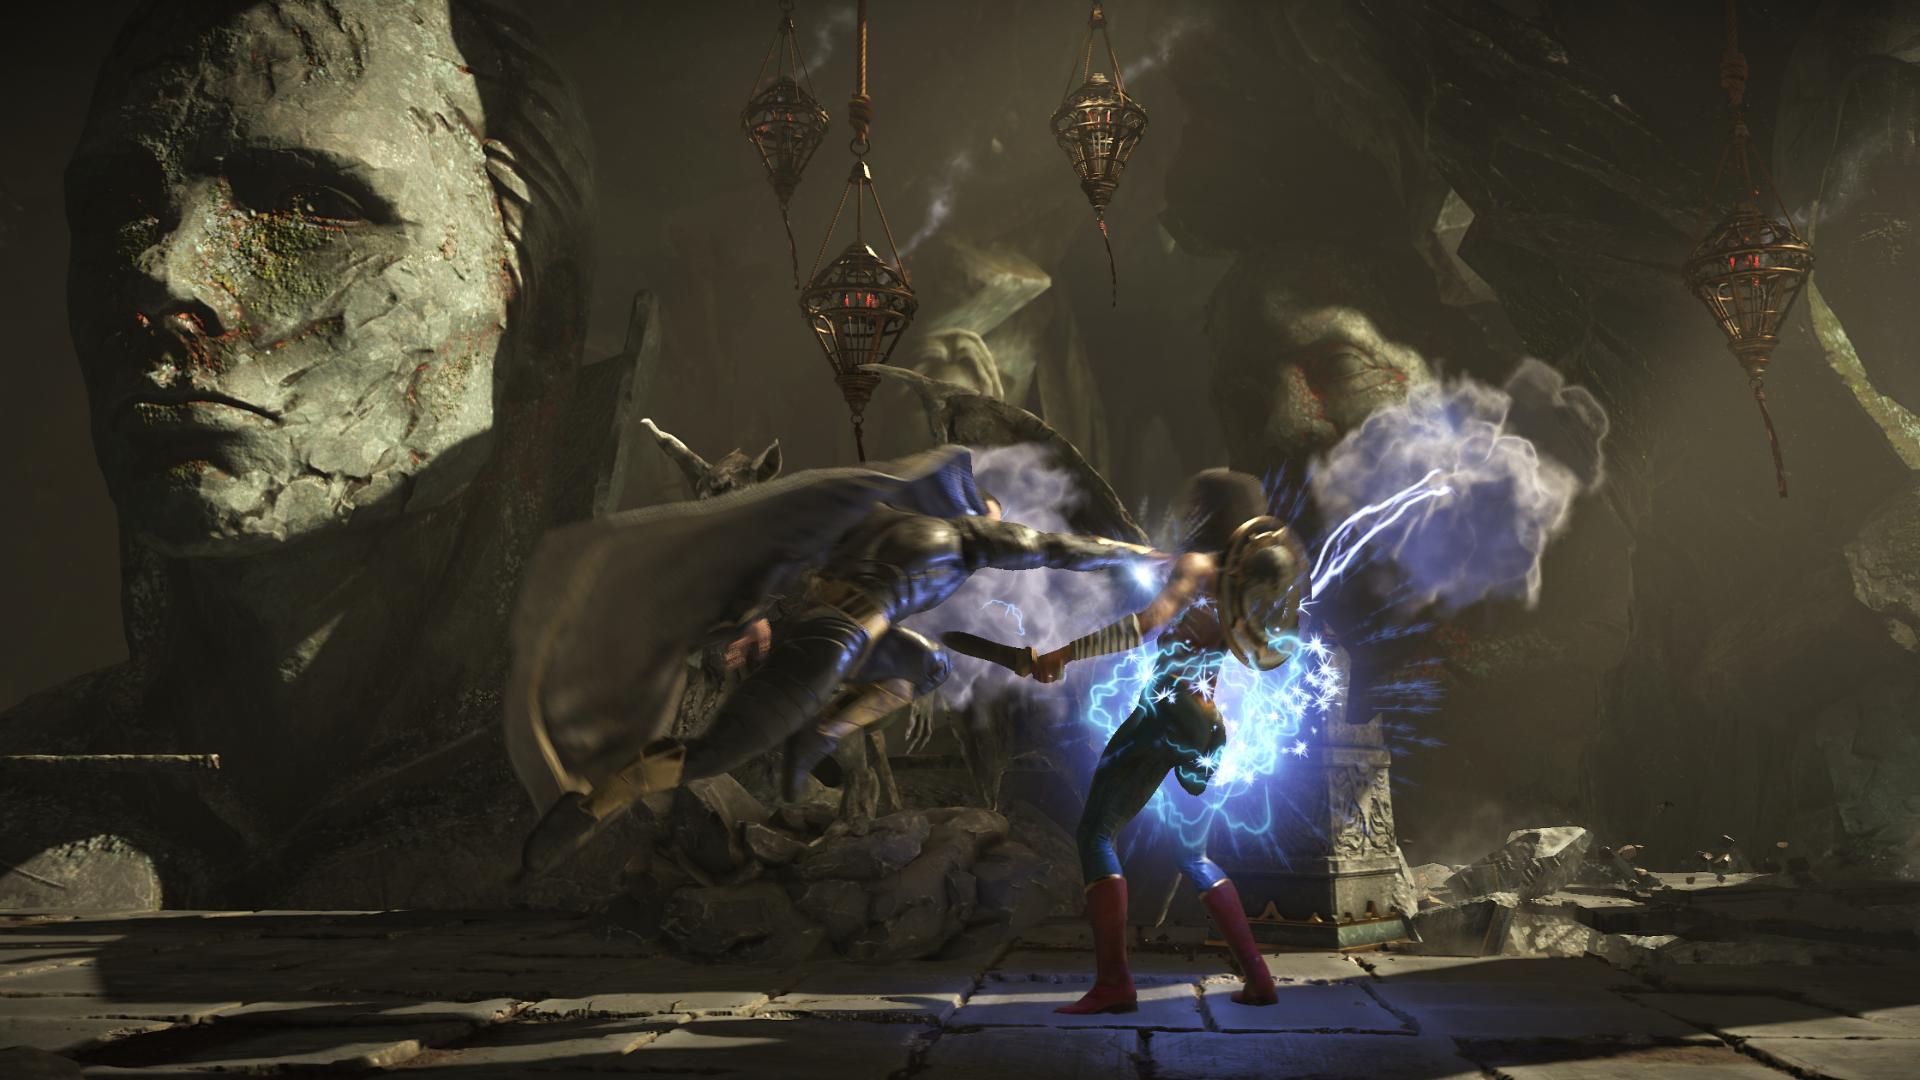 Black Adam Punching Wonder Woman in Kahndaq